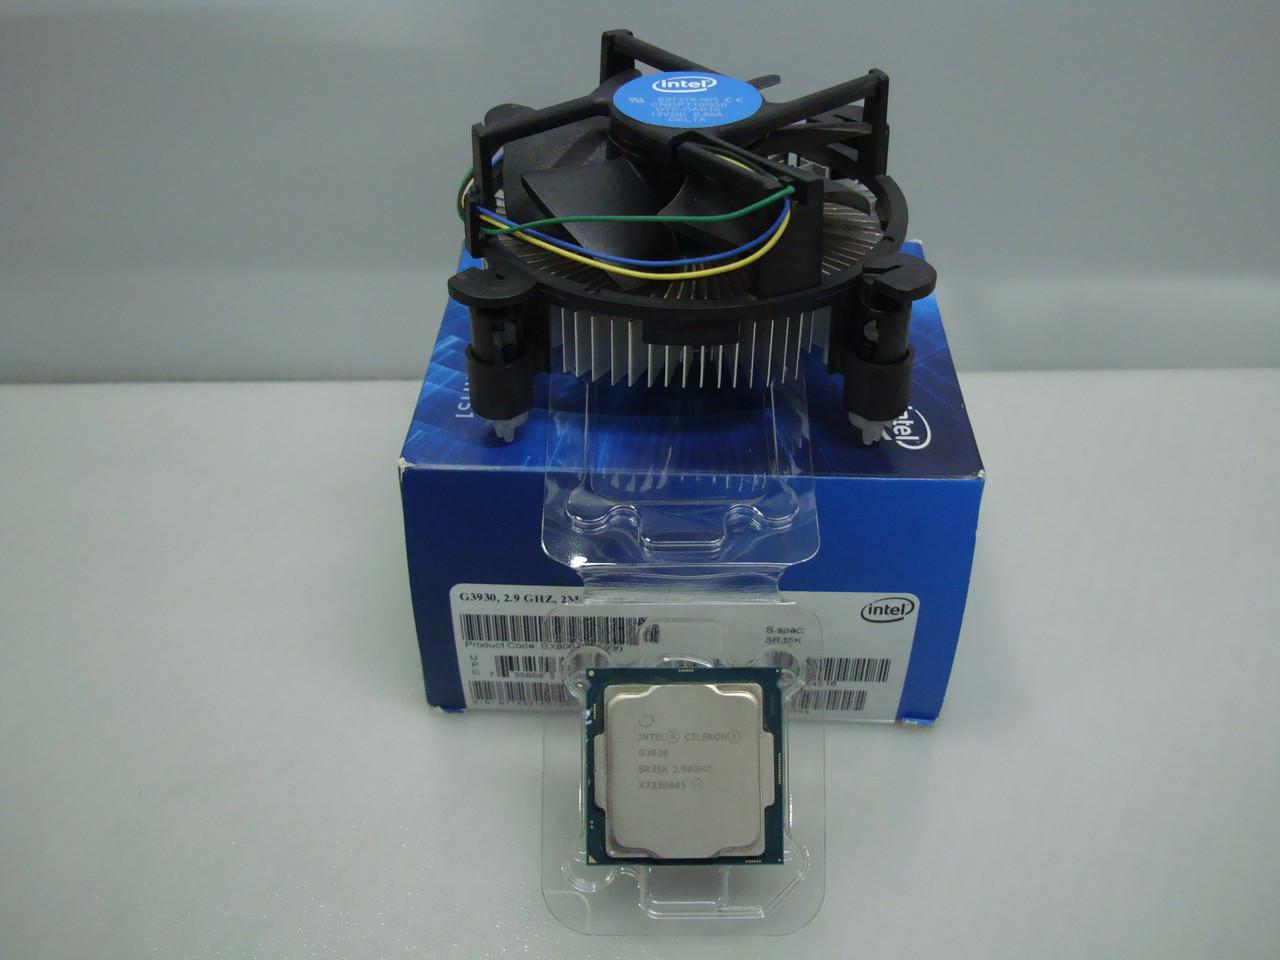 Процессор Celeron G3930 2.9GHz/8GT/s/2MB socket1151/Kaby Lake